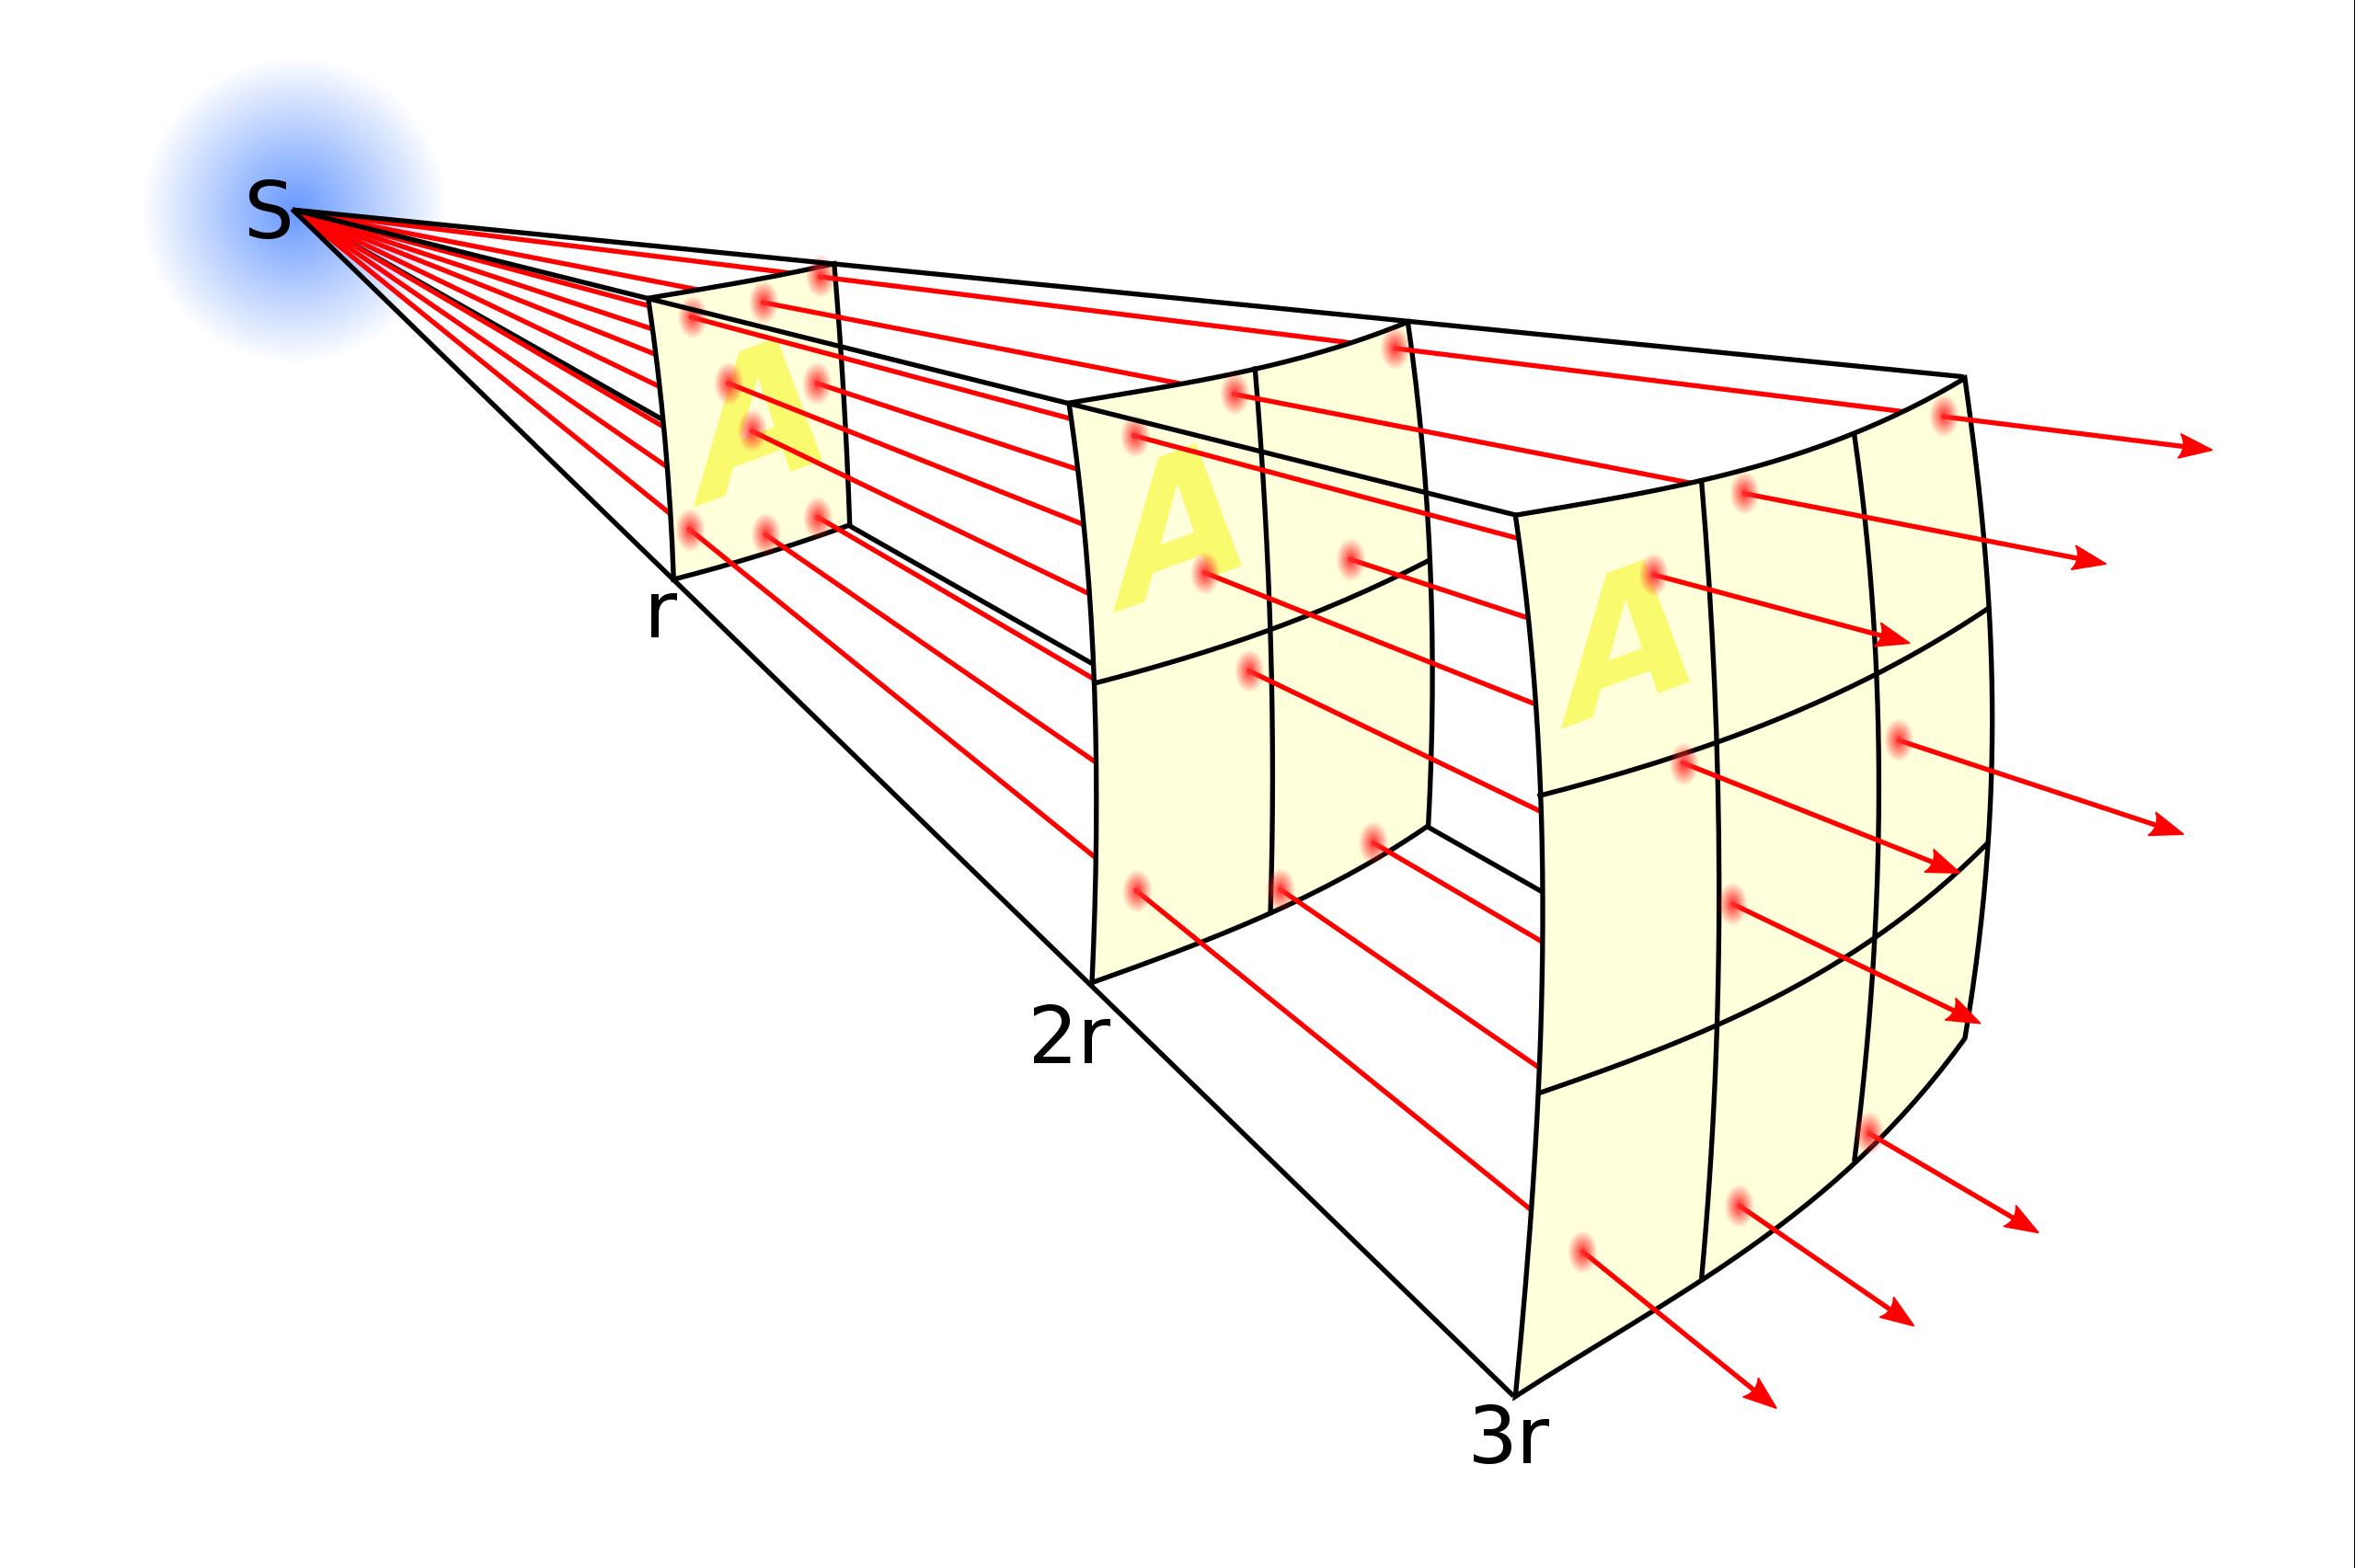 https://en.wikipedia.org/wiki/Inverse-square_law